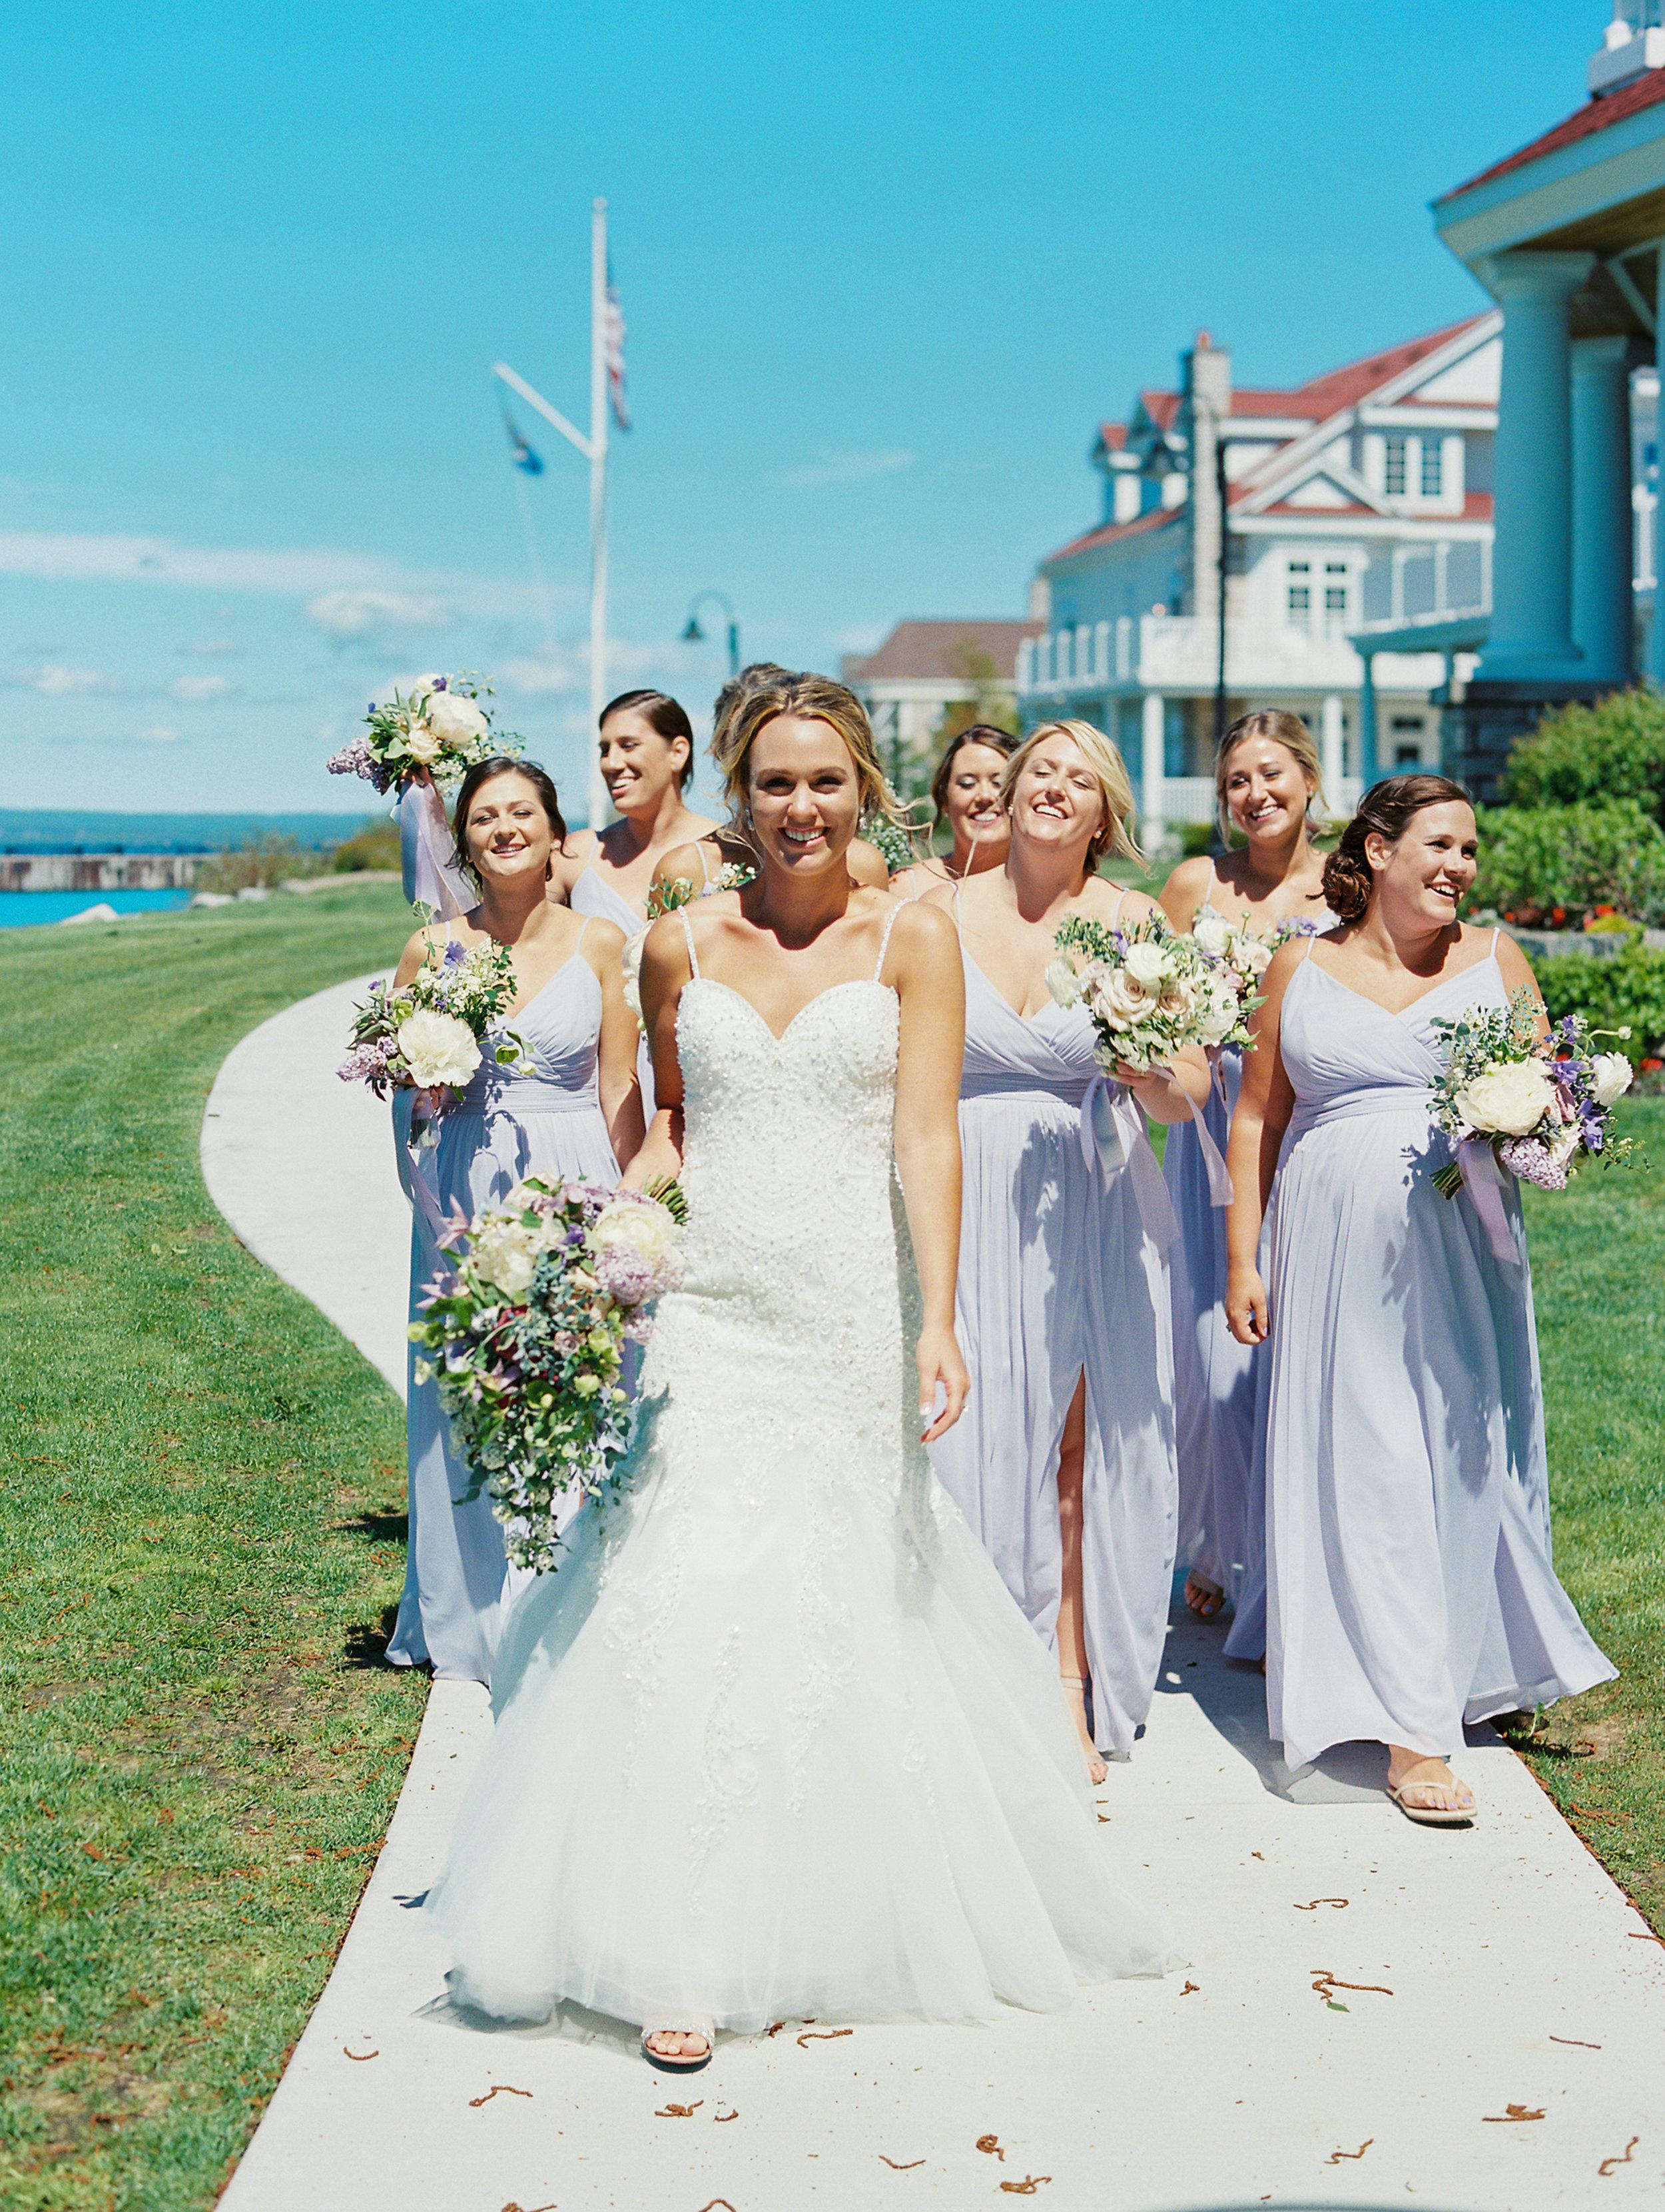 Noss+Wedding+Bride+Bridesmaids-23.jpg